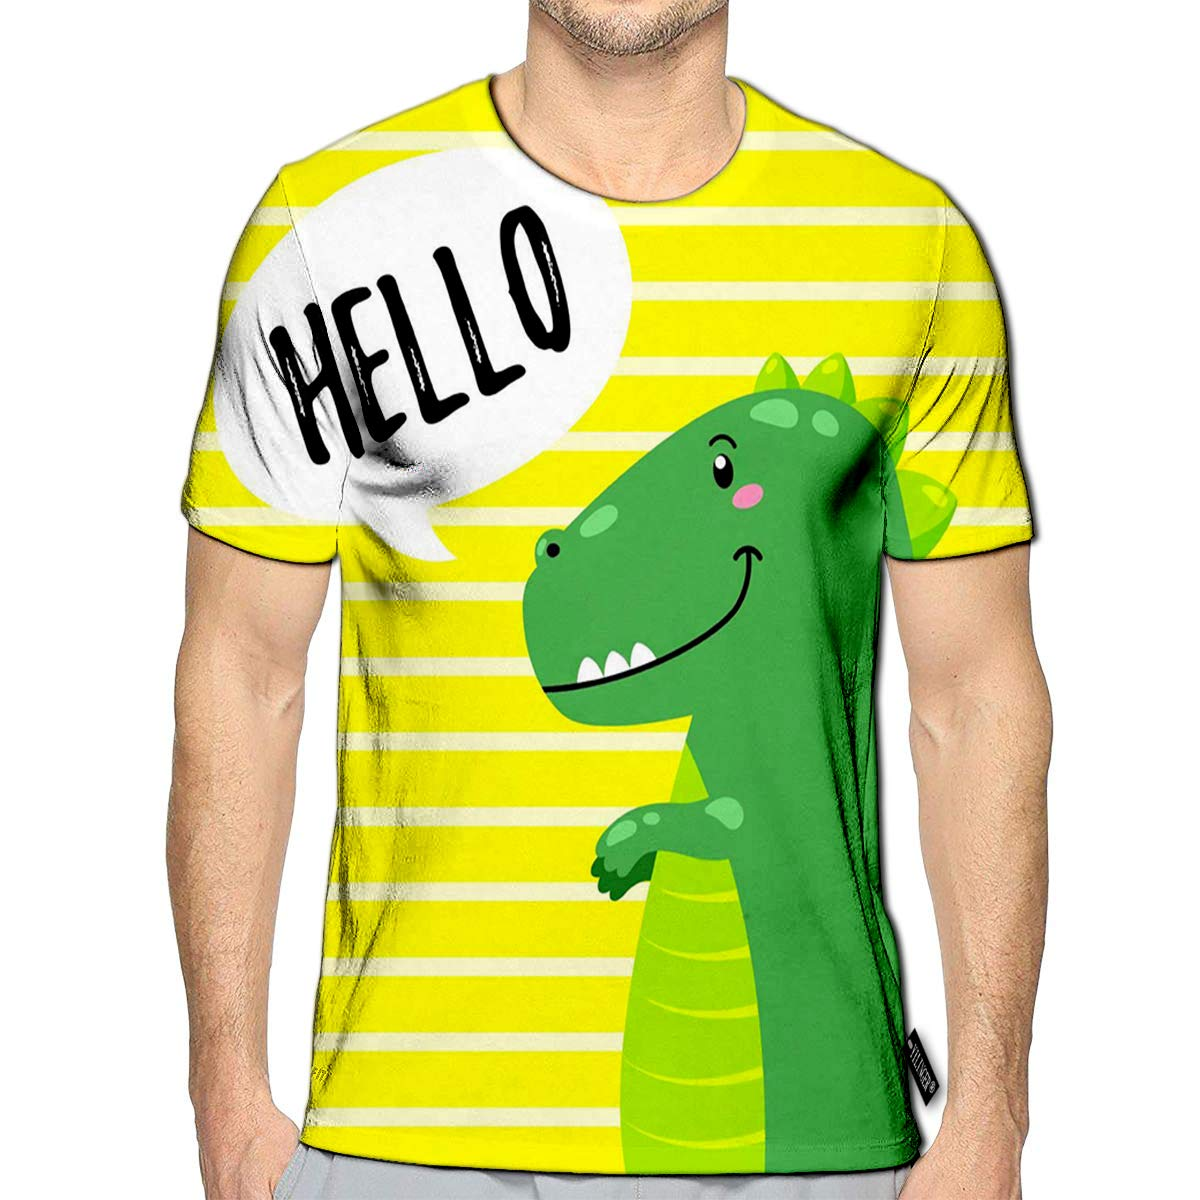 3D Printed T-Shirts I Don Care Seagulls Creative Short Sleeve Tops Tees